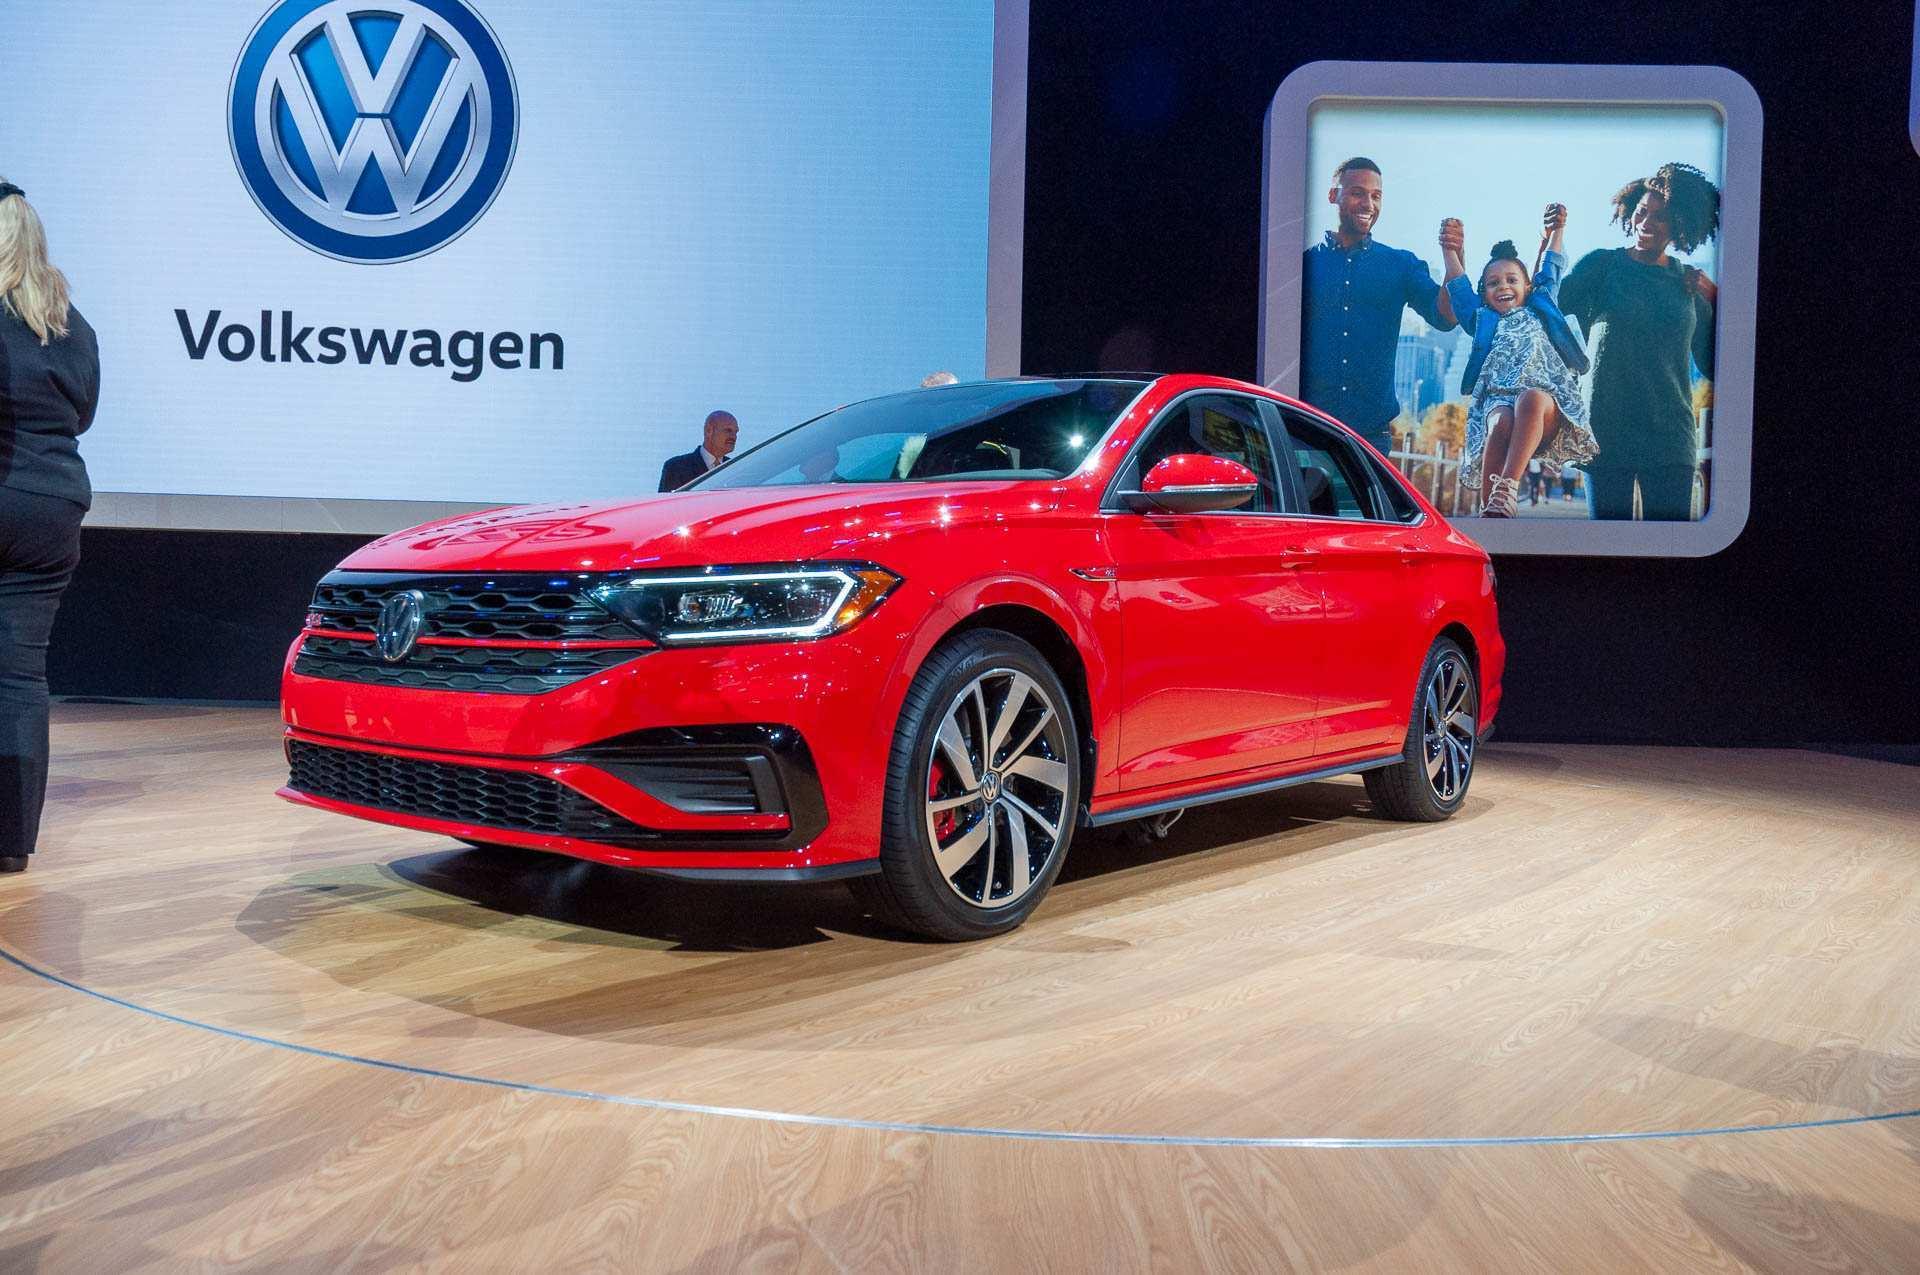 92 Gallery of New Volkswagen Jetta Gli 2019 Redesign And Concept Wallpaper with New Volkswagen Jetta Gli 2019 Redesign And Concept